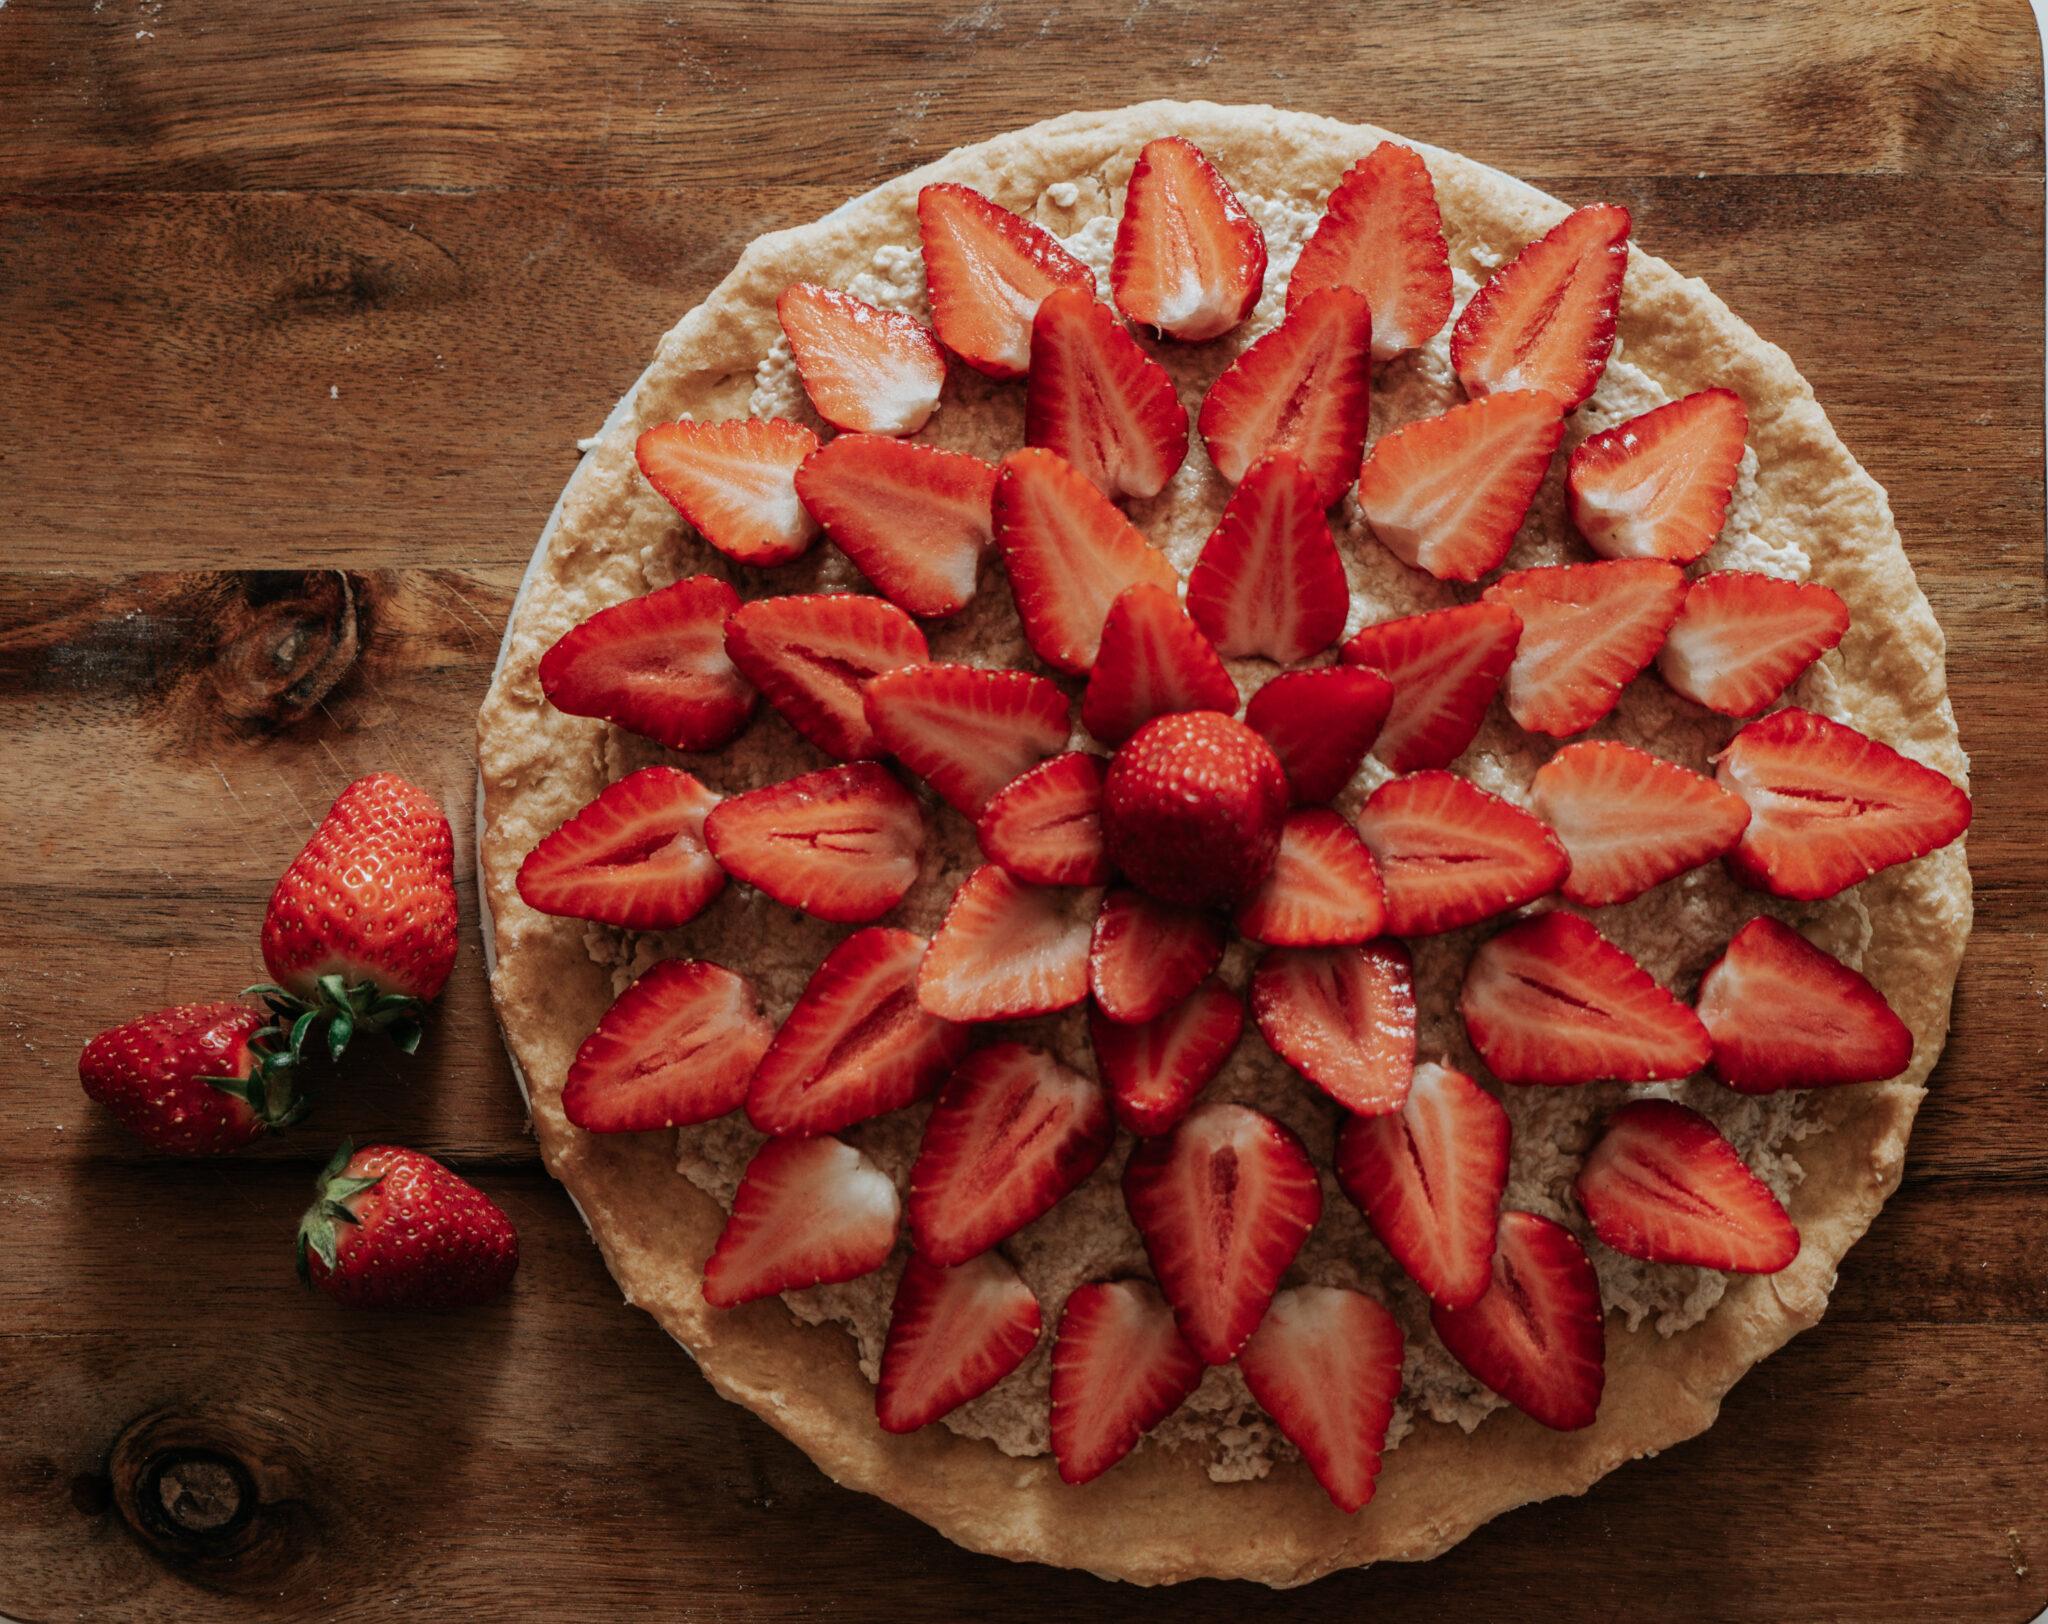 tarte aux fraises - strawberry pie - bodyandfly - food blogger